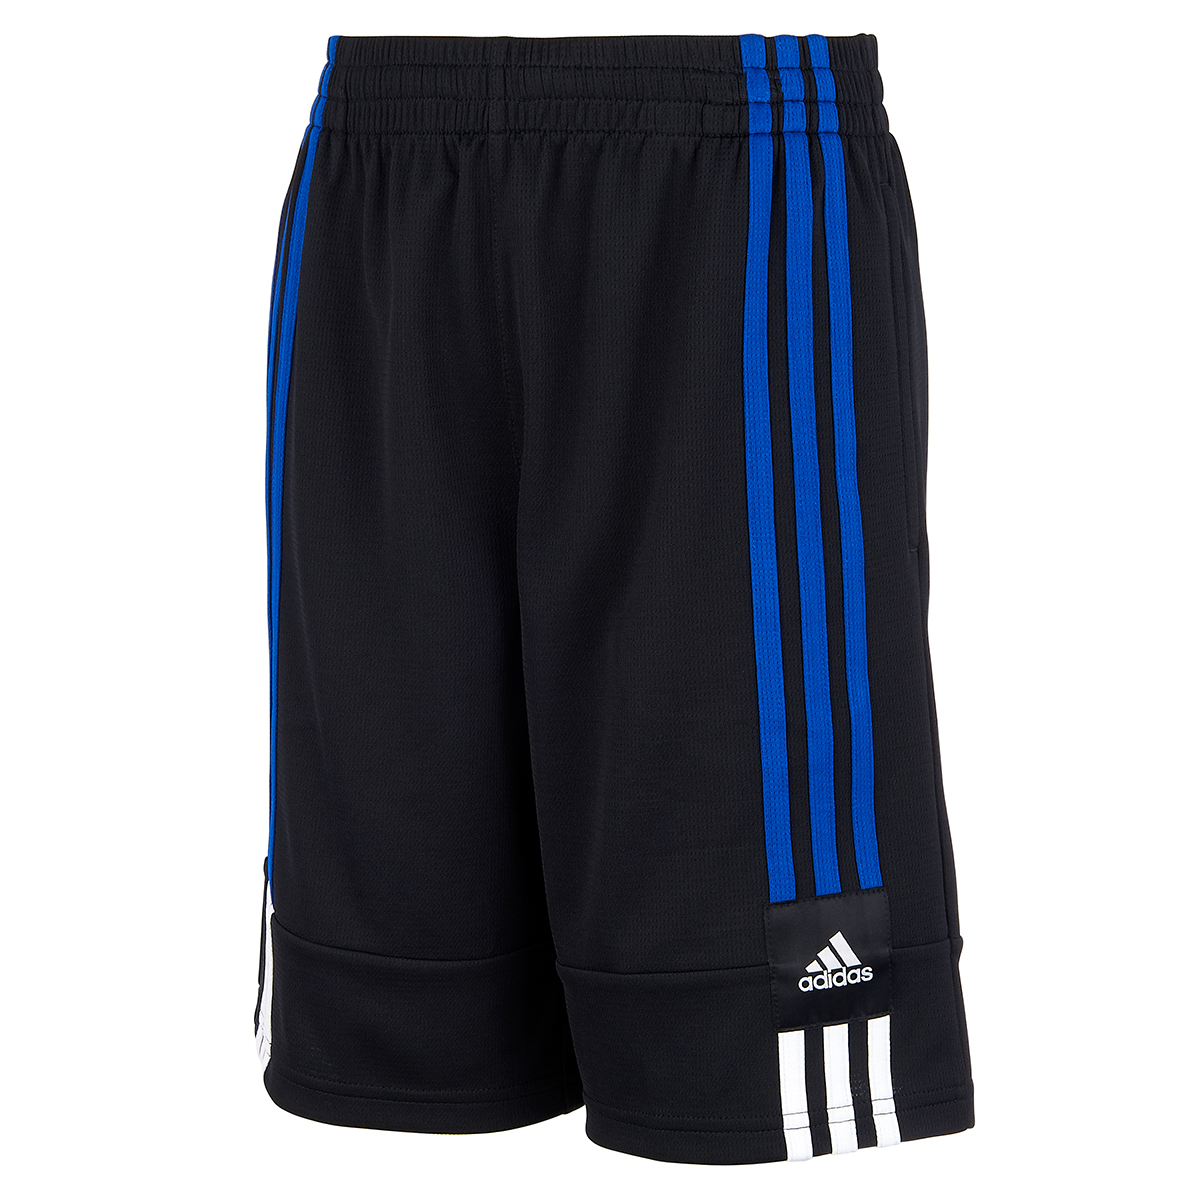 Adidas Boys' 3G Speed X Shorts - Black, XL